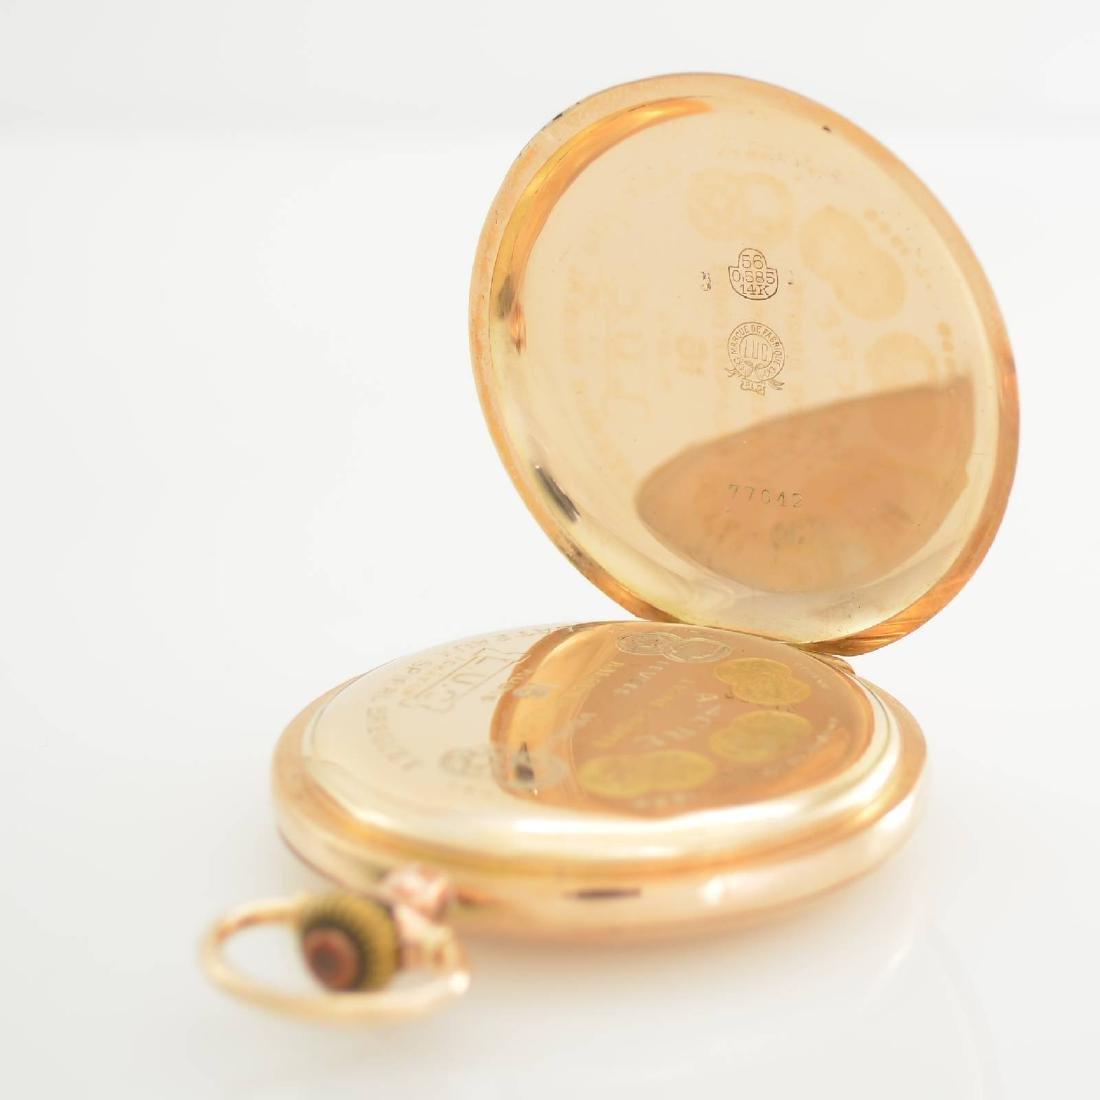 L.U.C. Chopard 14k pink gold pocket watch - 4